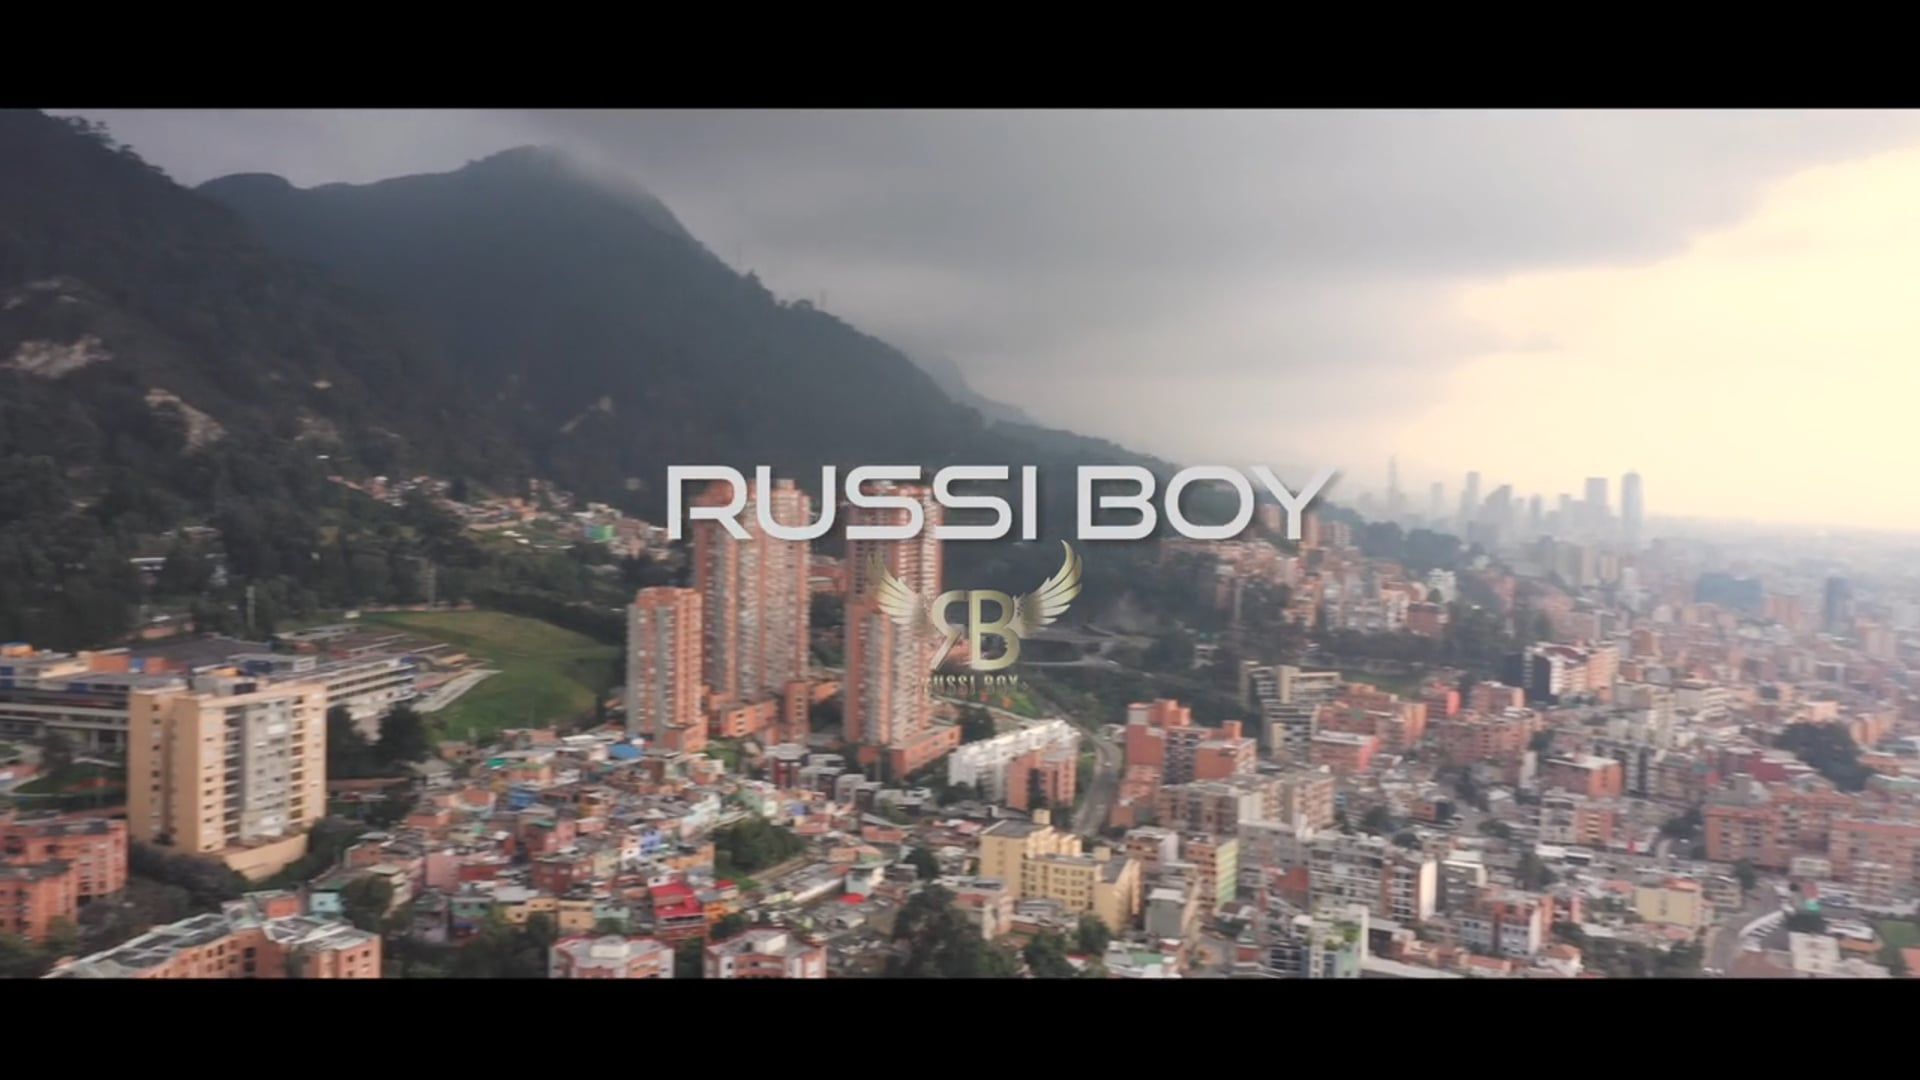 Me Matas - Russi Boy FINAL 1920